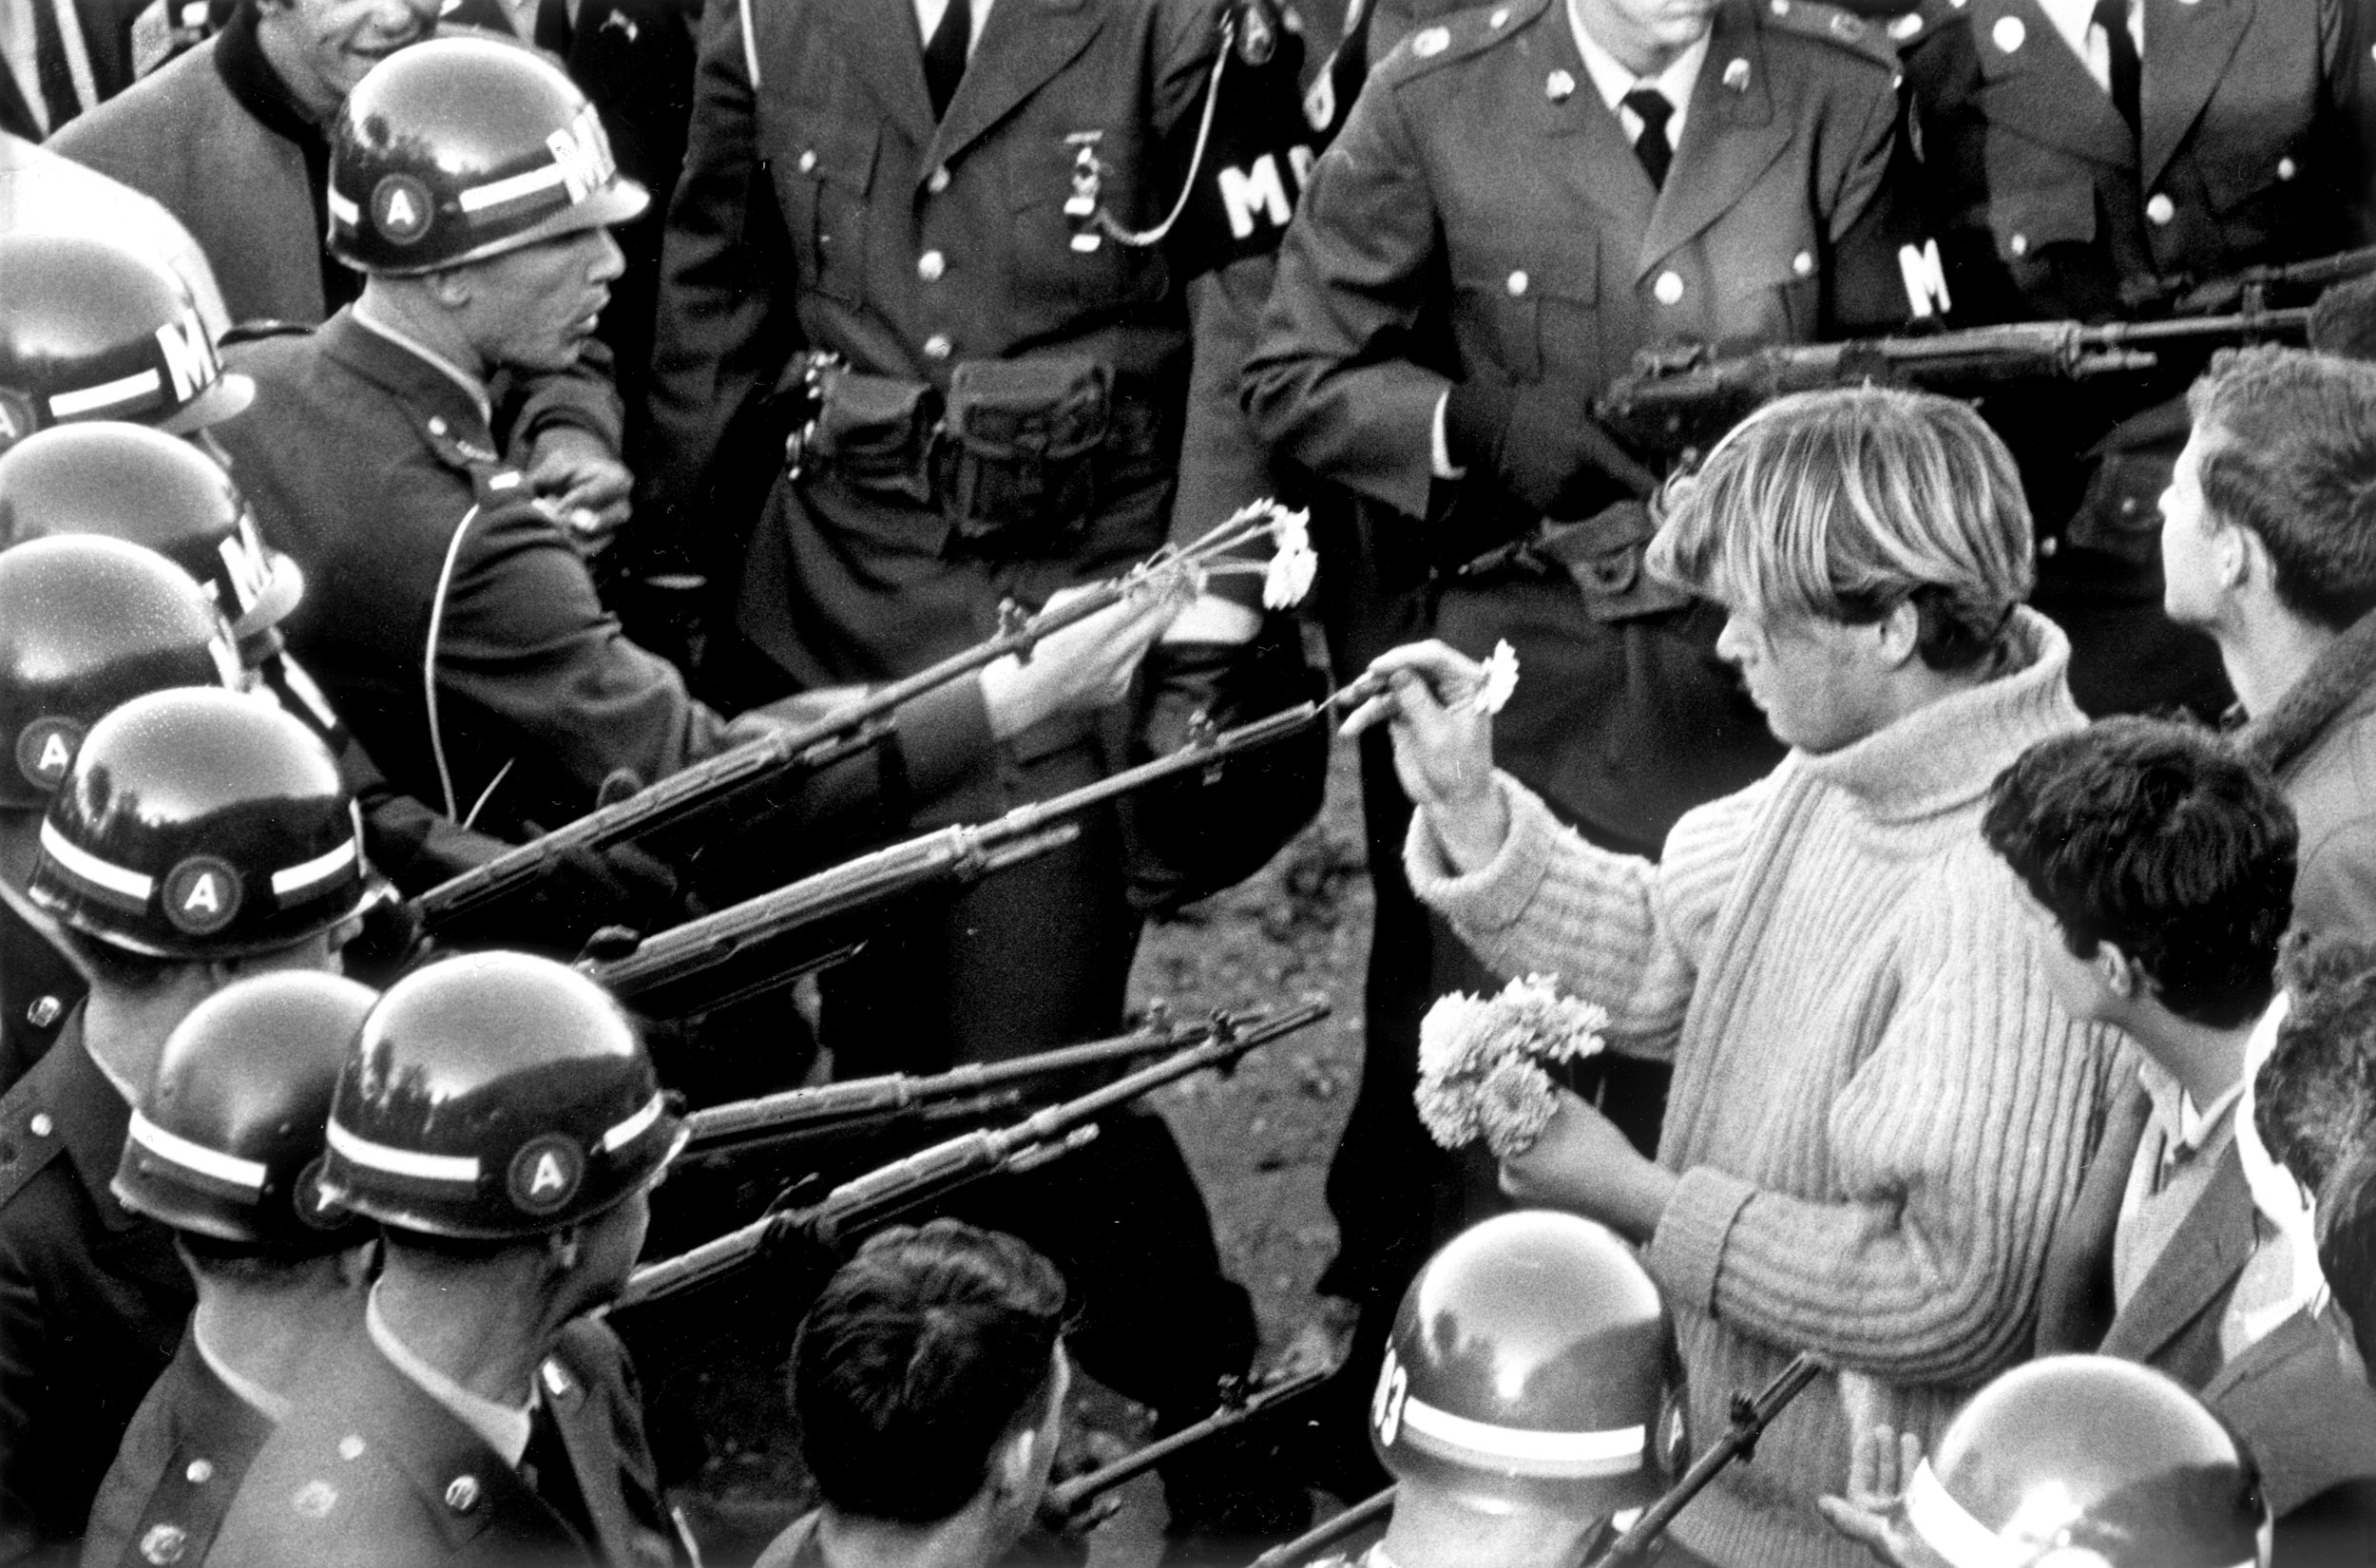 160909122356-anti-vietnam-demonstration-the-pentagon-you-say-you-want-a-revolution.jpg